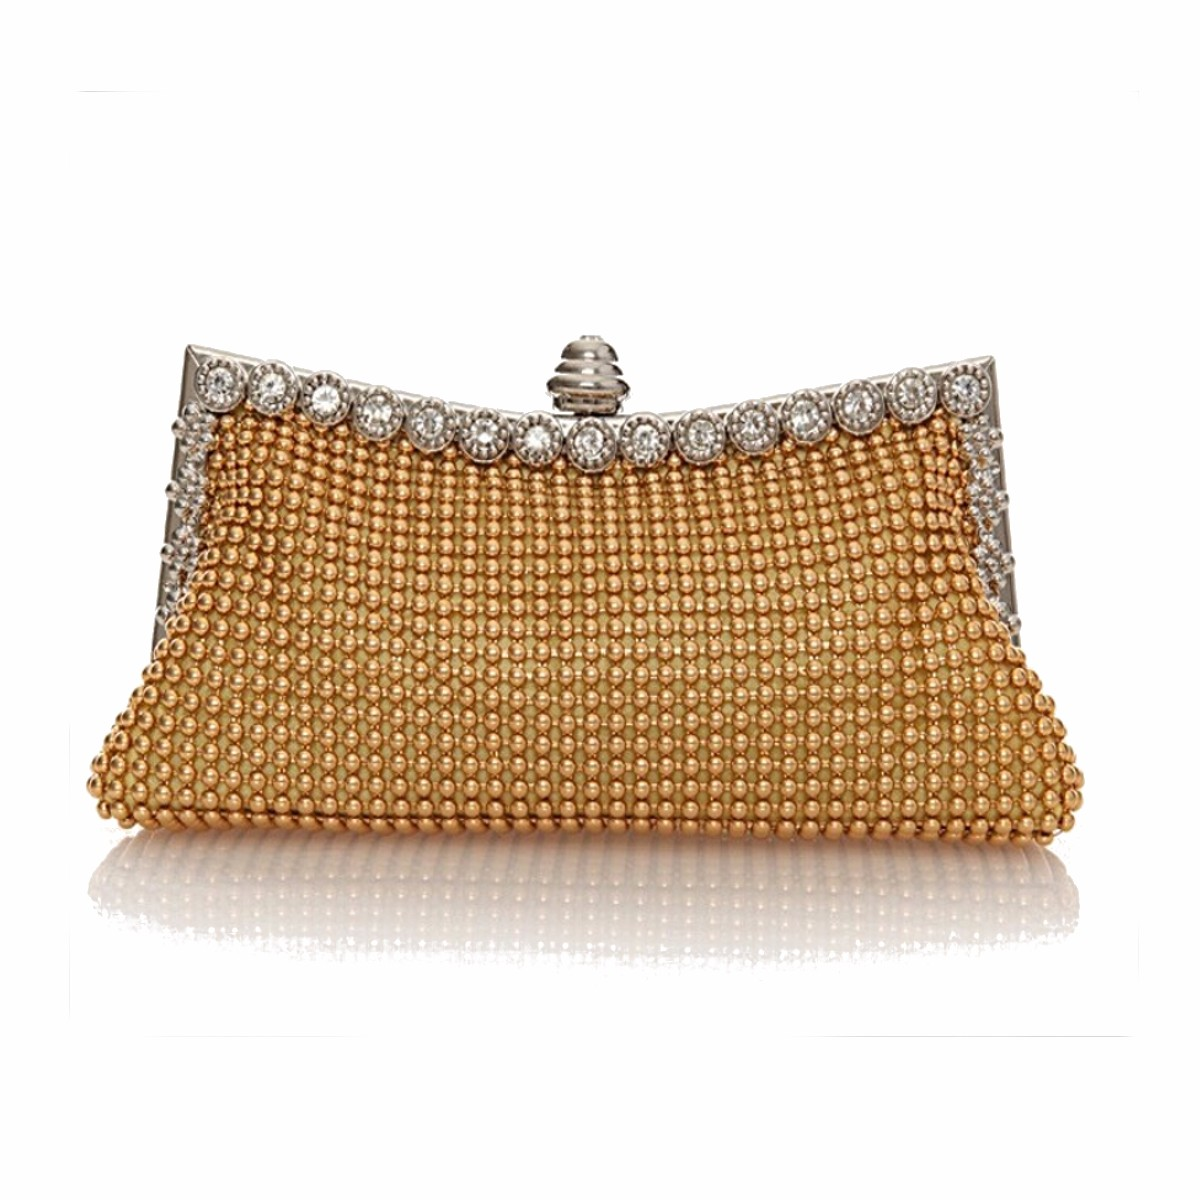 Uk Women Evening Prom Handbag Beaded Clutch Bag